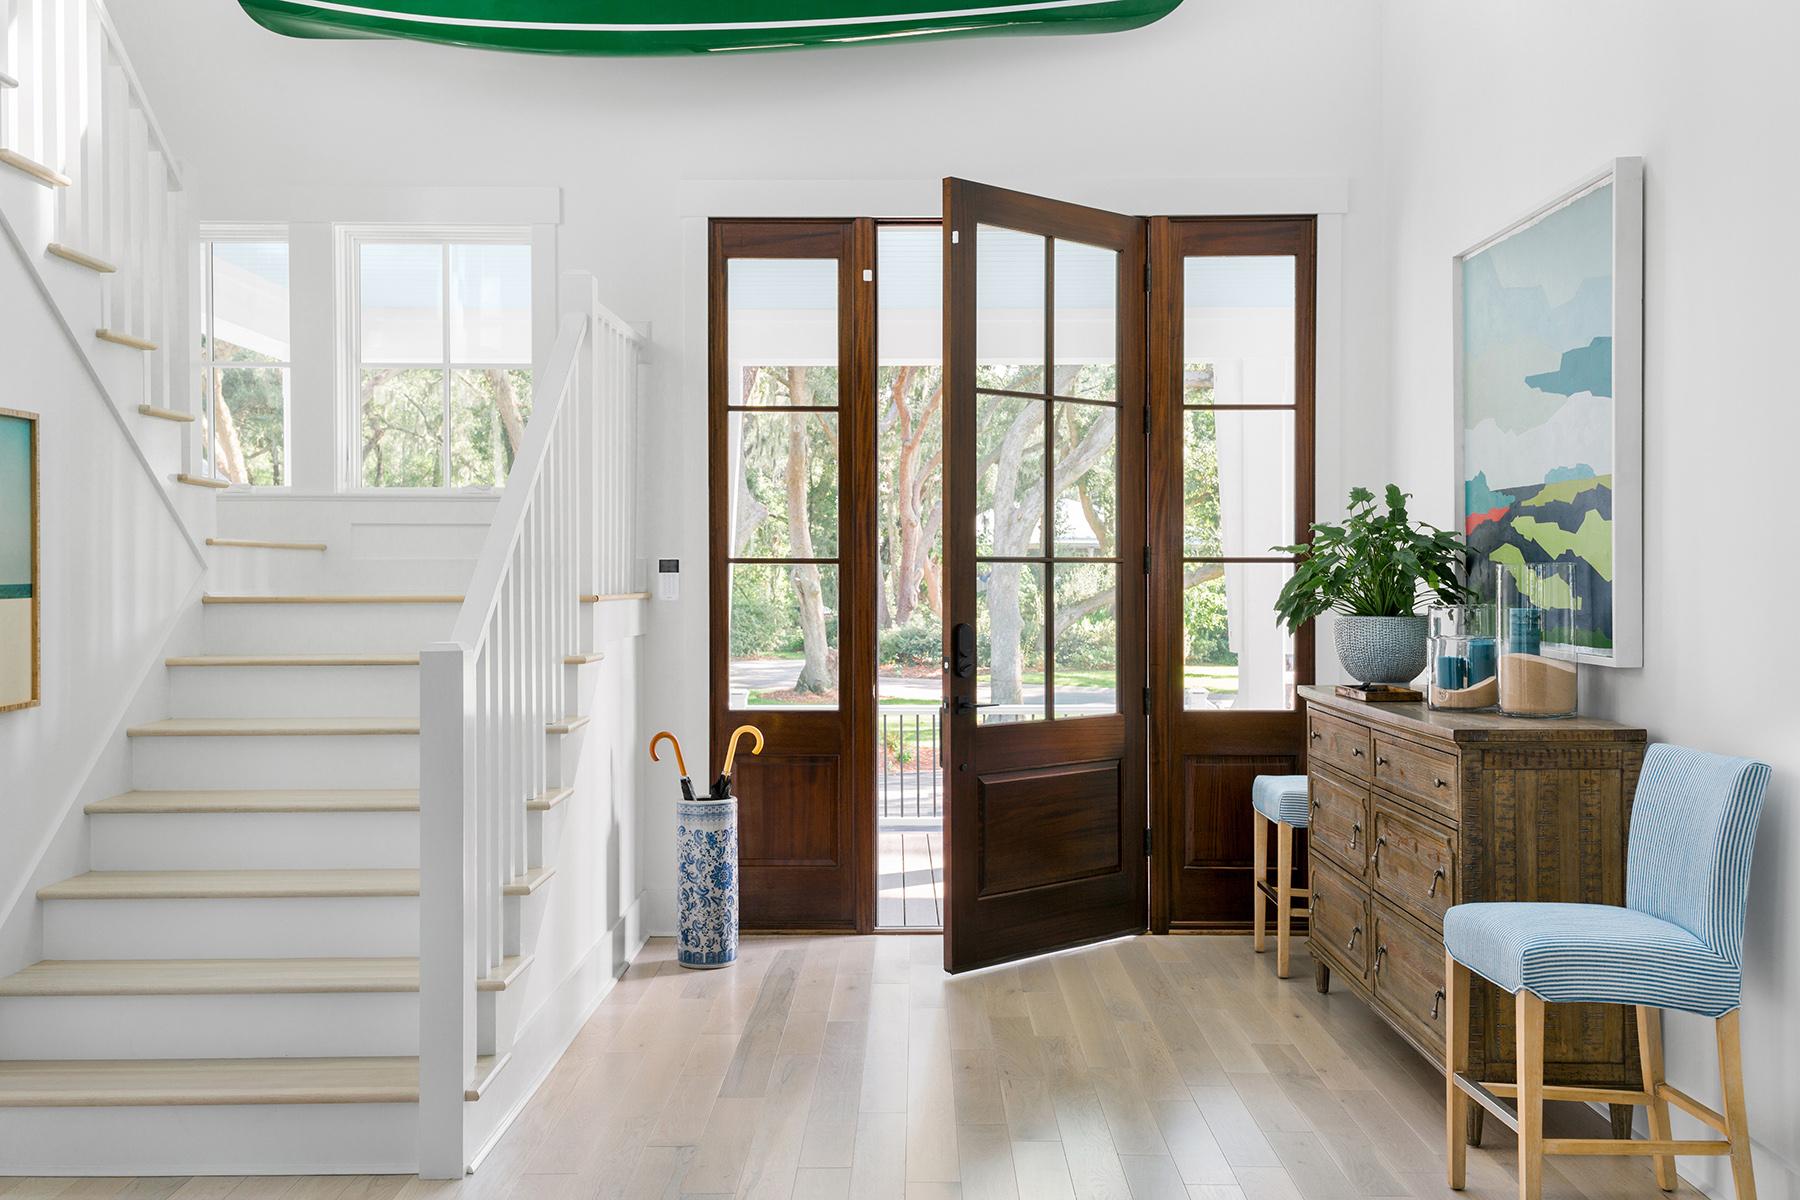 2020 Dream Home.Hgtv Opens The Doors To The Spectacular Hgtv Dream Home 2020